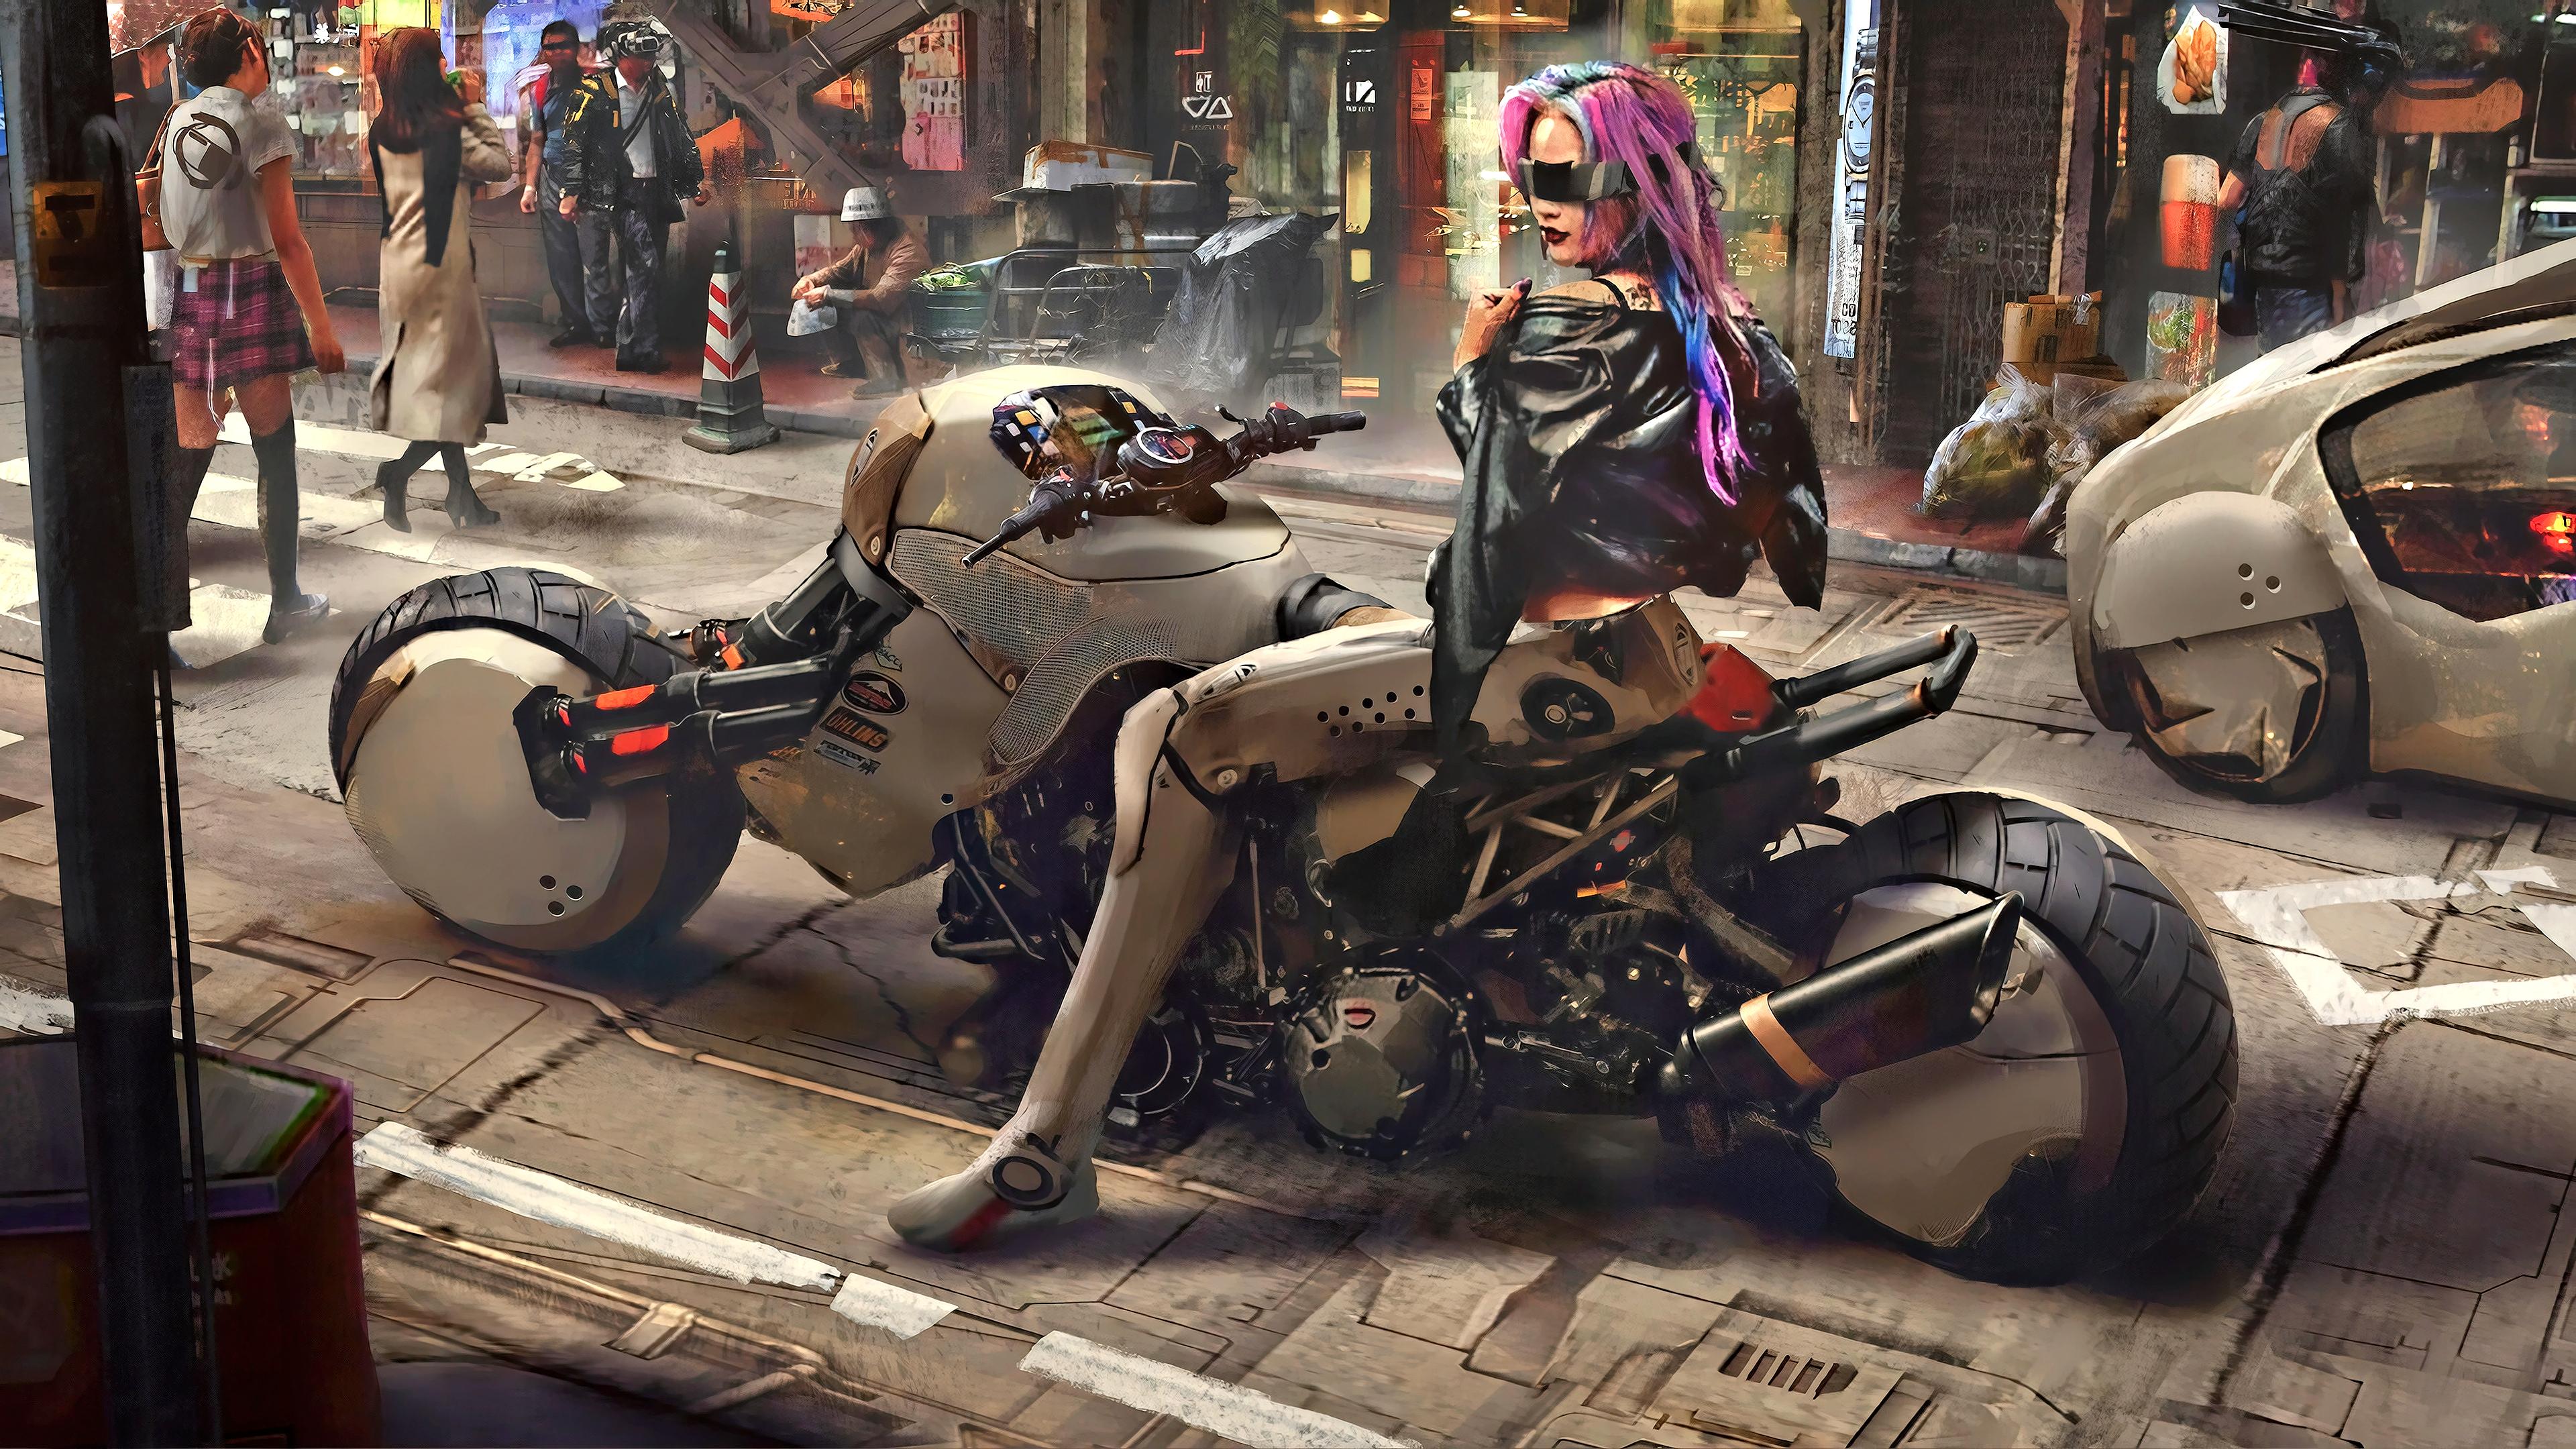 General 3840x2160 cityscape science fiction digital art concept art artwork futuristic fantasy art fan art 3D CGI cyberpunk cyber city women vehicle cyborg